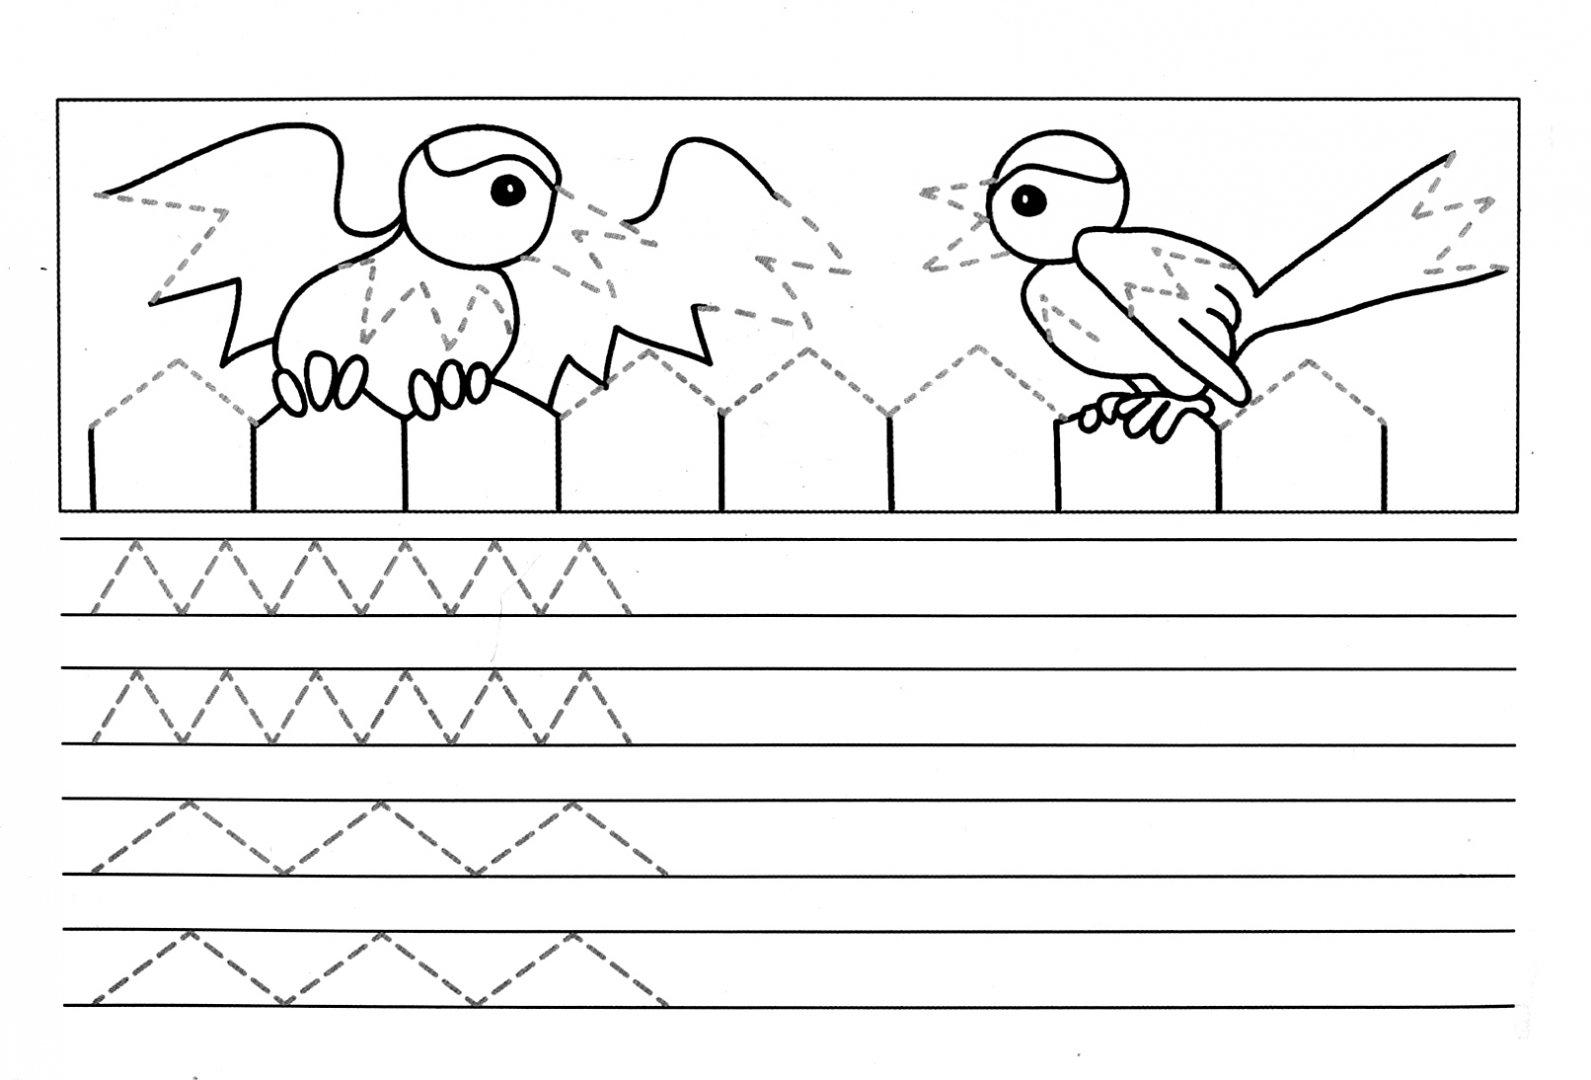 Иллюстрация 1 из 12 для Палочки, крючочки, петельки - И. Попова   Лабиринт - книги. Источник: Лабиринт